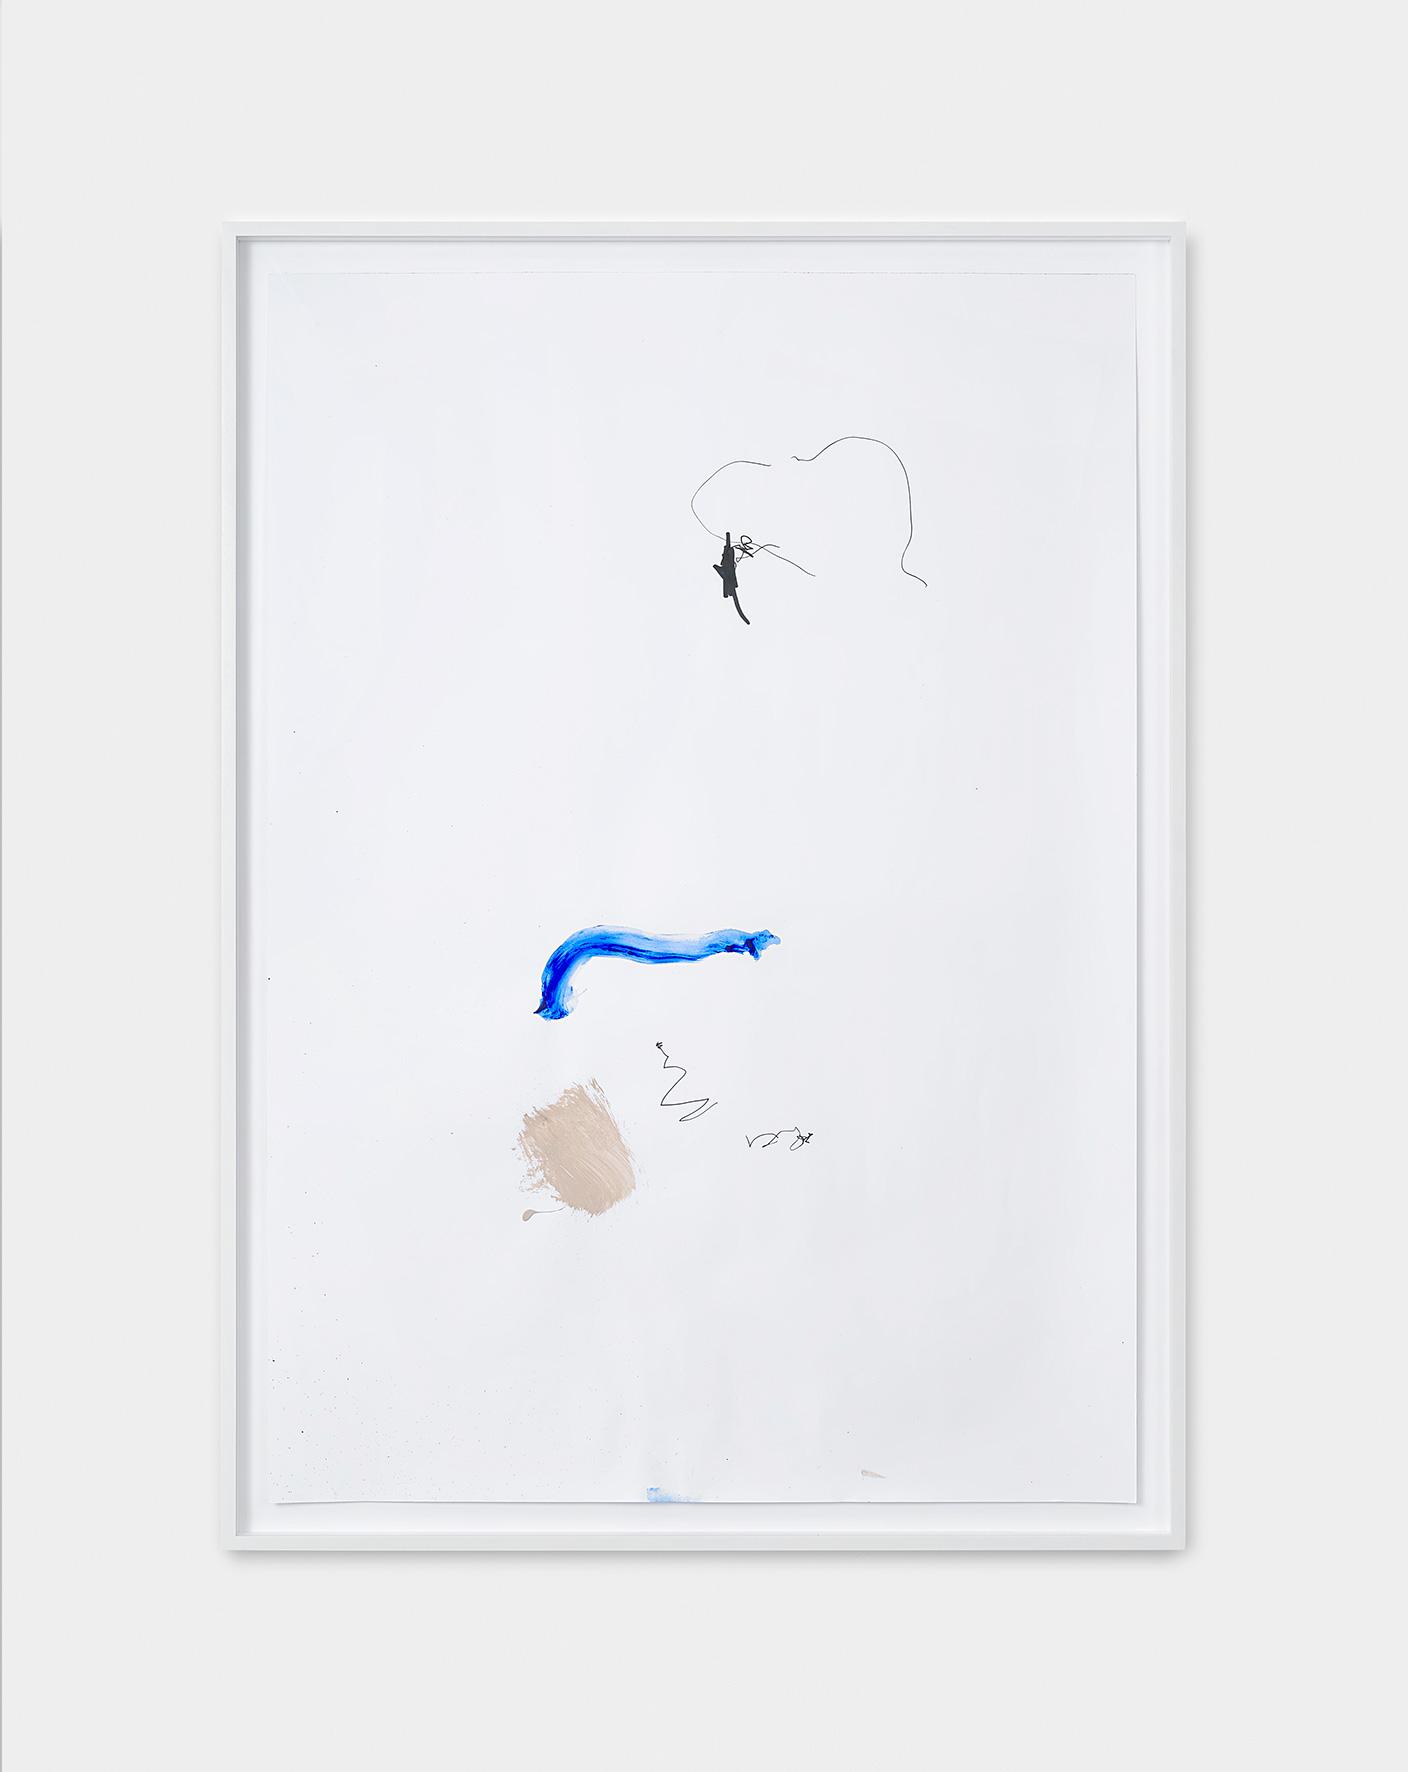 181218 | 2018 | Acryl, Lack, Tusche auf Papier | 95 x 65 cm | ©GALERIE ALBER